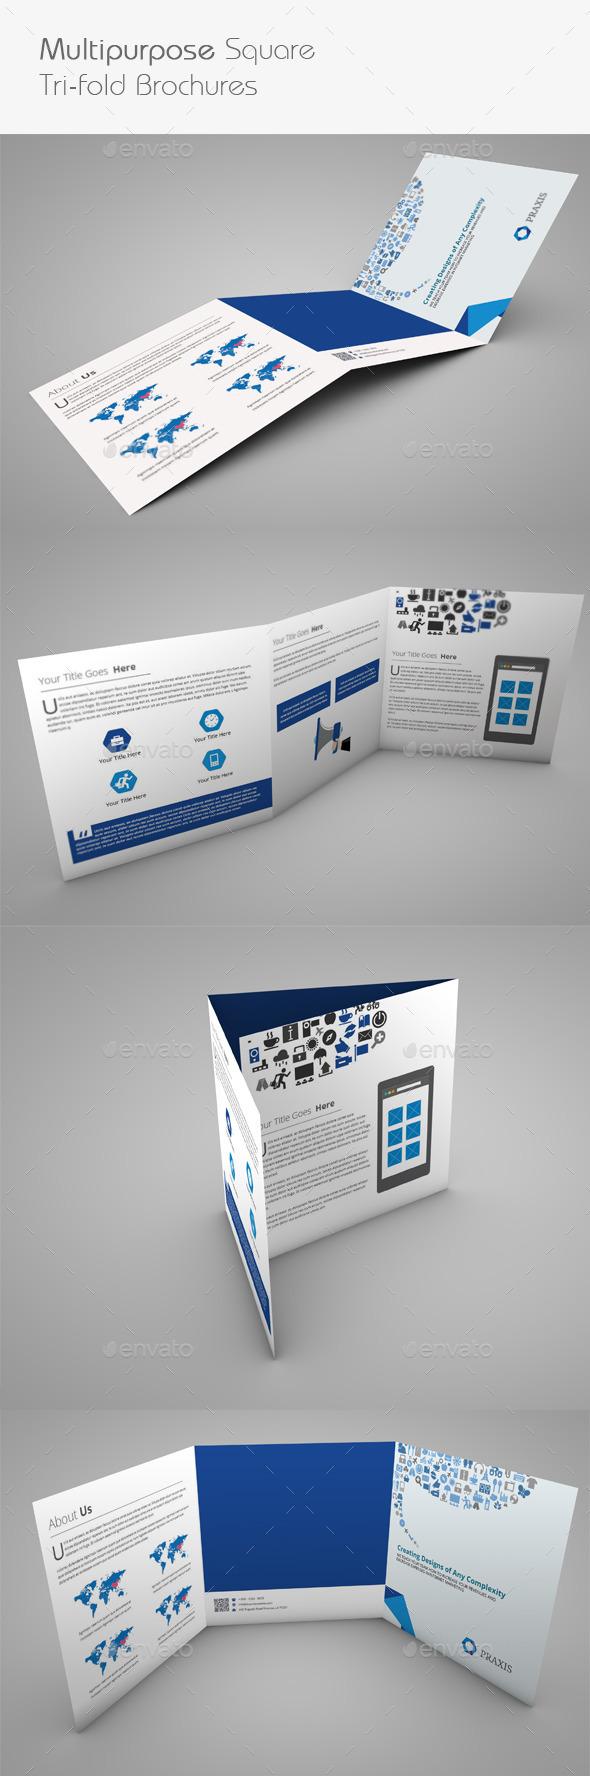 Multipurpose Square Tri-Fold Brochures - Brochures Print Templates